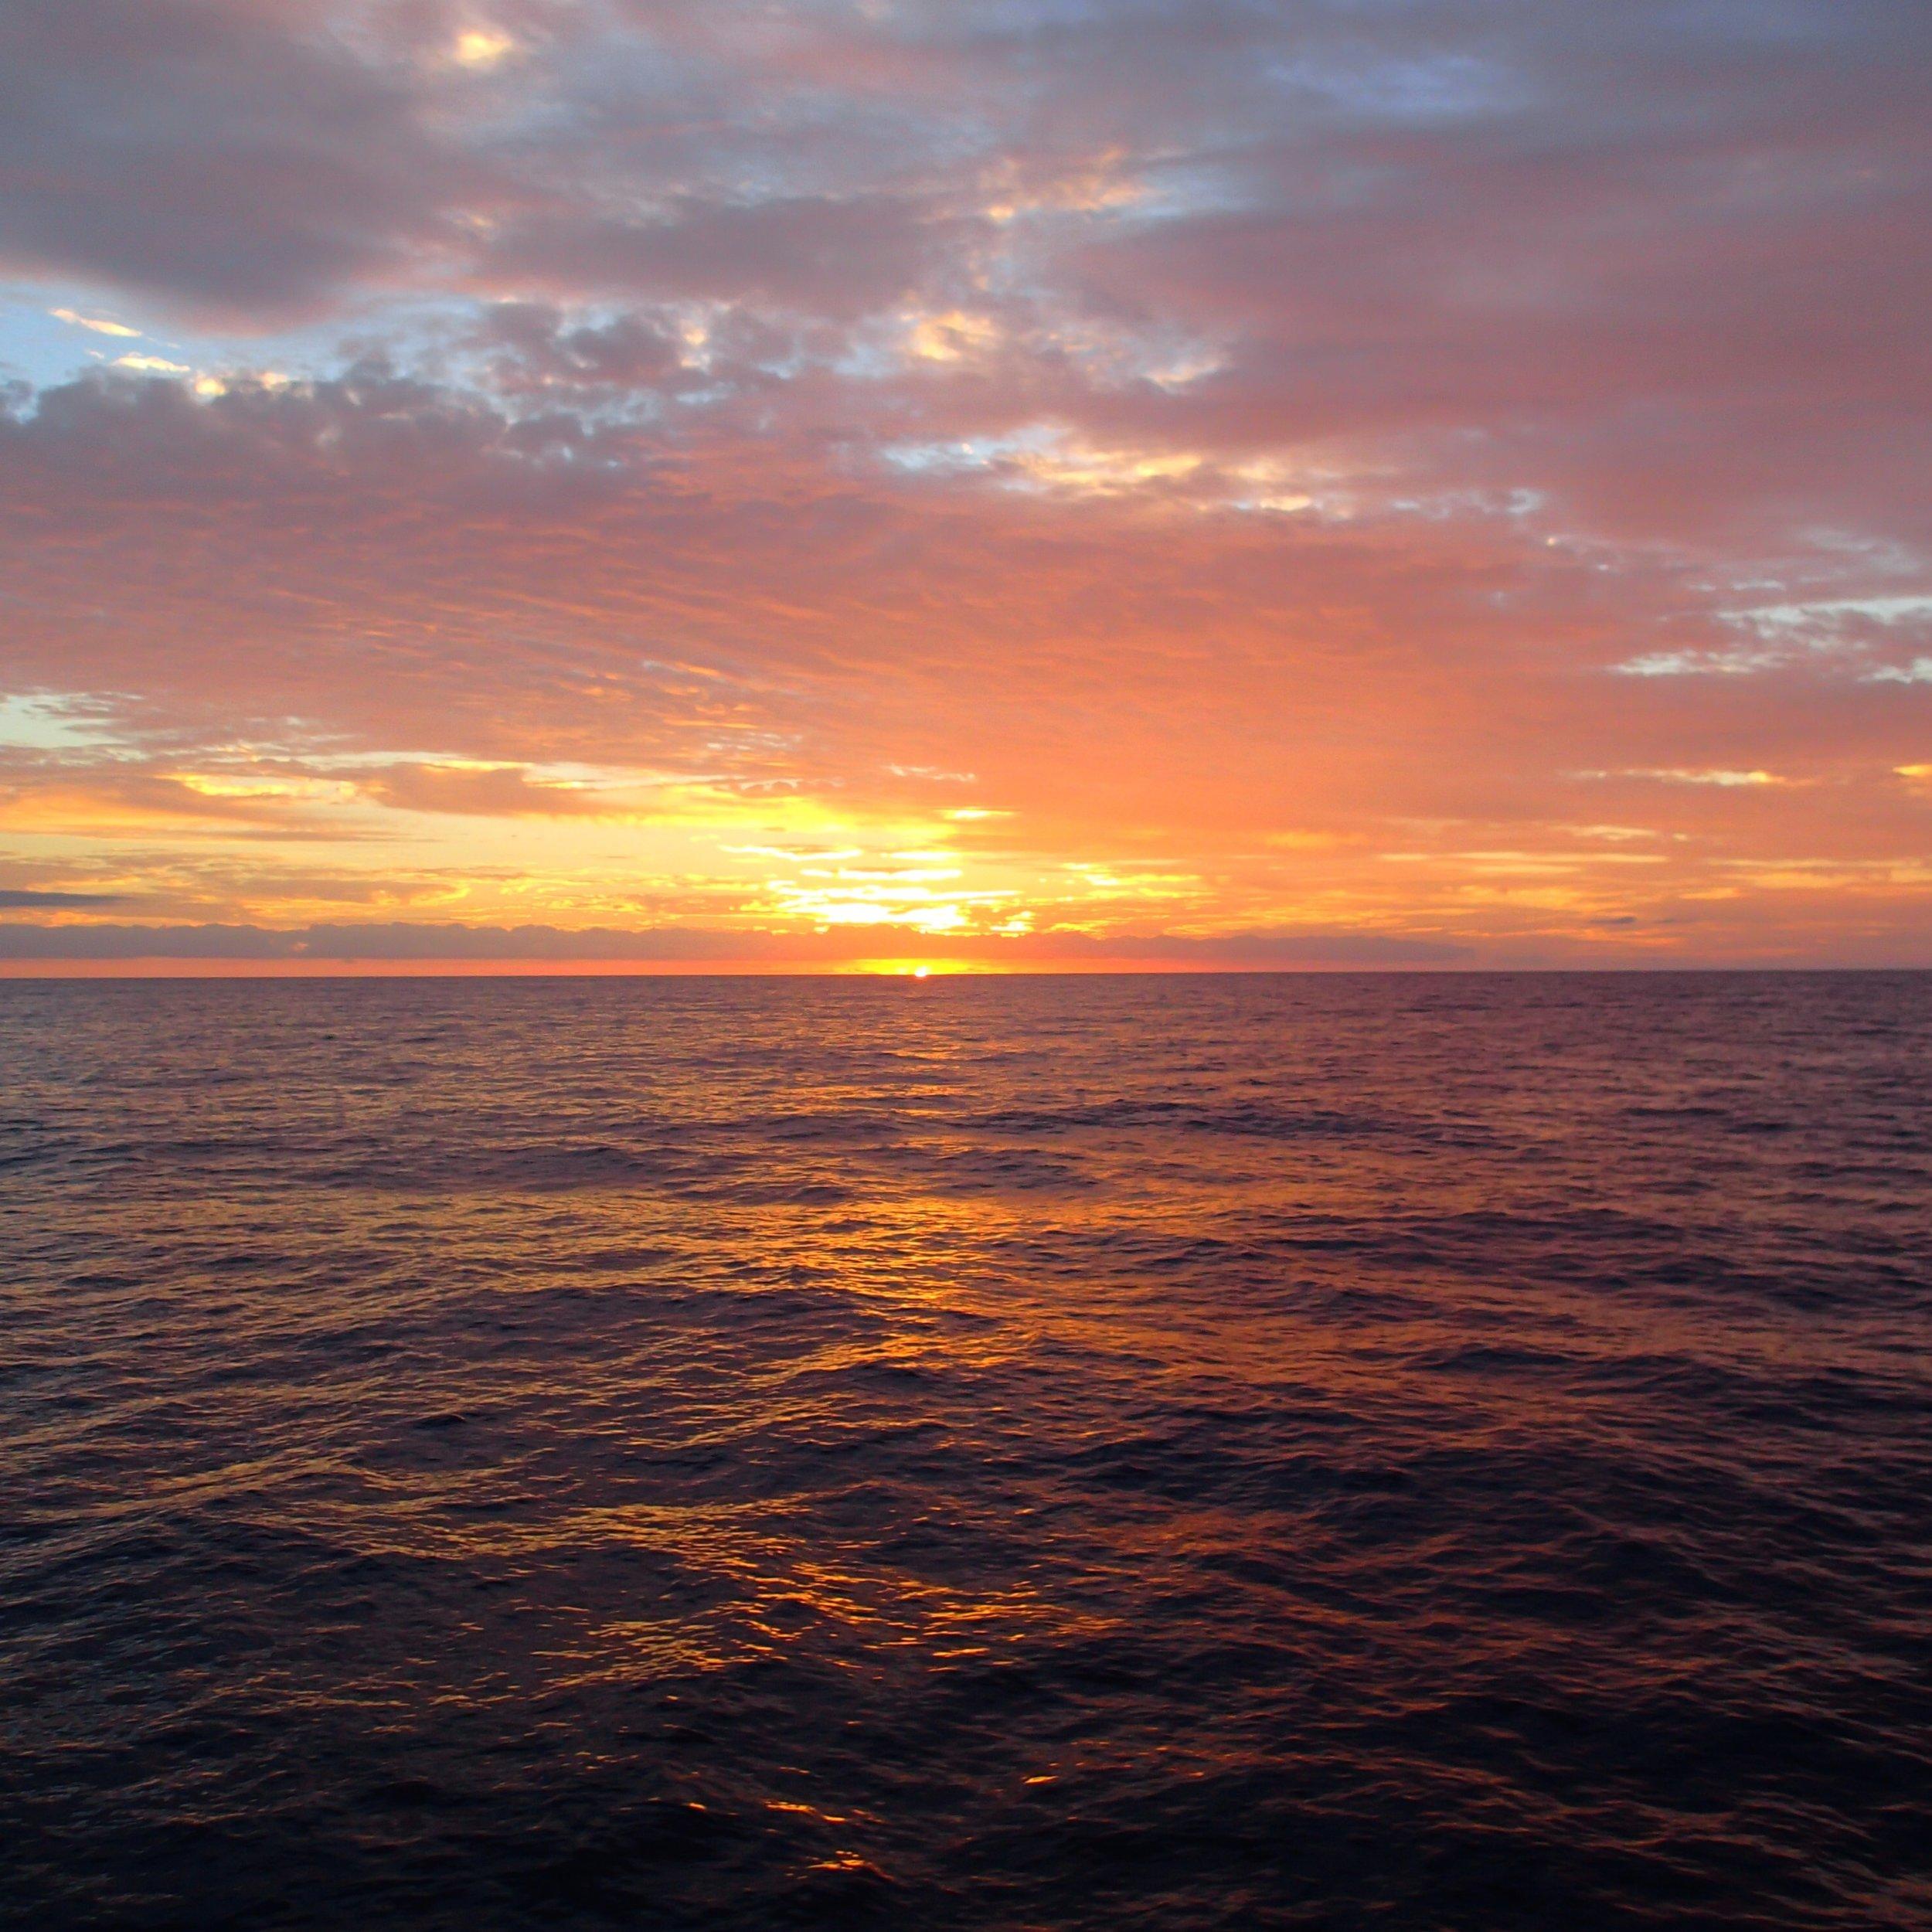 11-5-13 sunset.jpg